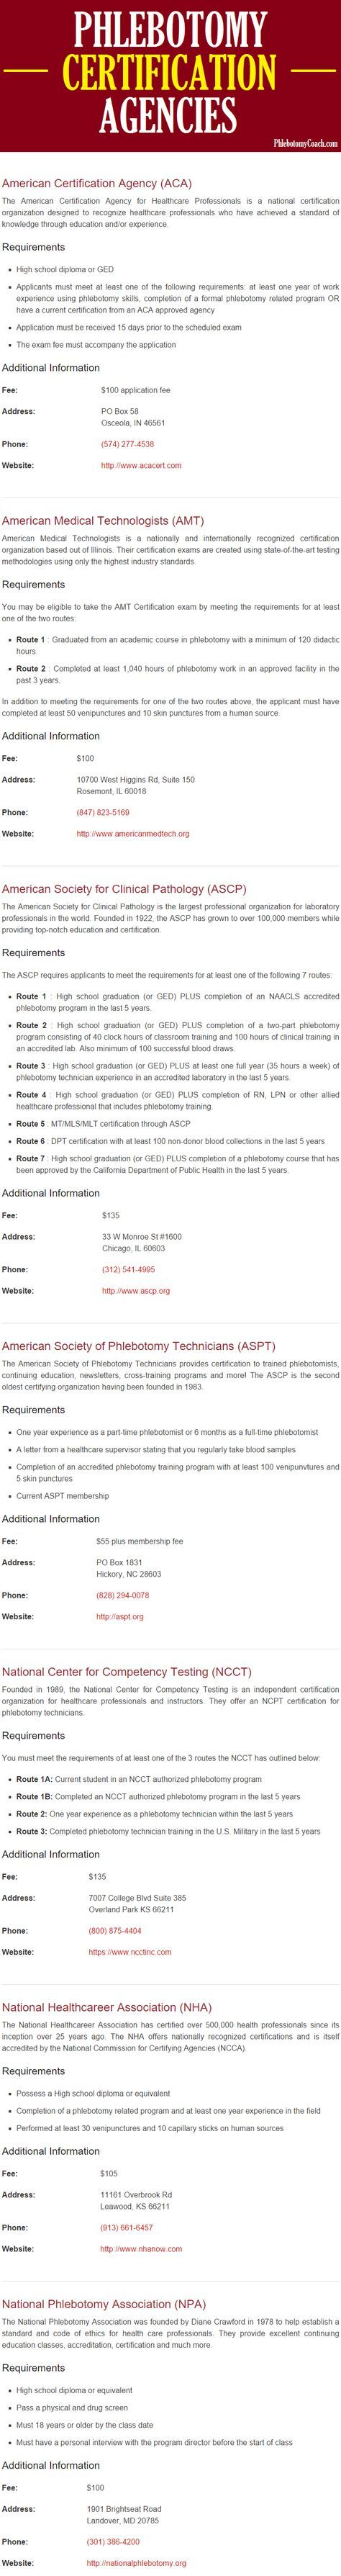 National phlebotomy certification programs that will jump start national phlebotomy certification programs that will jump start your career as a phlebotomist xflitez Gallery